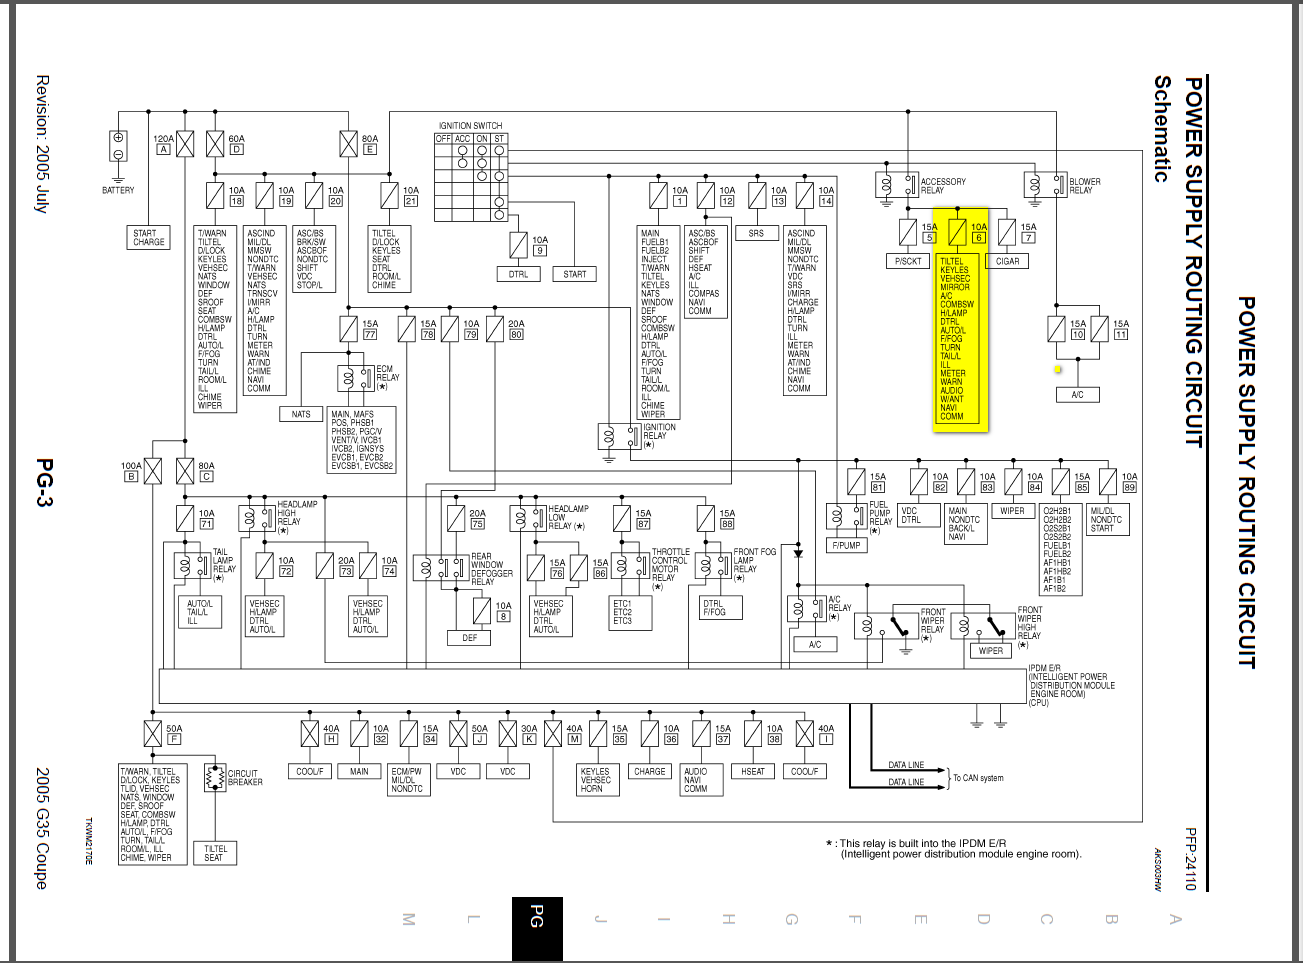 [wrg-6653] fuse box for infiniti m35